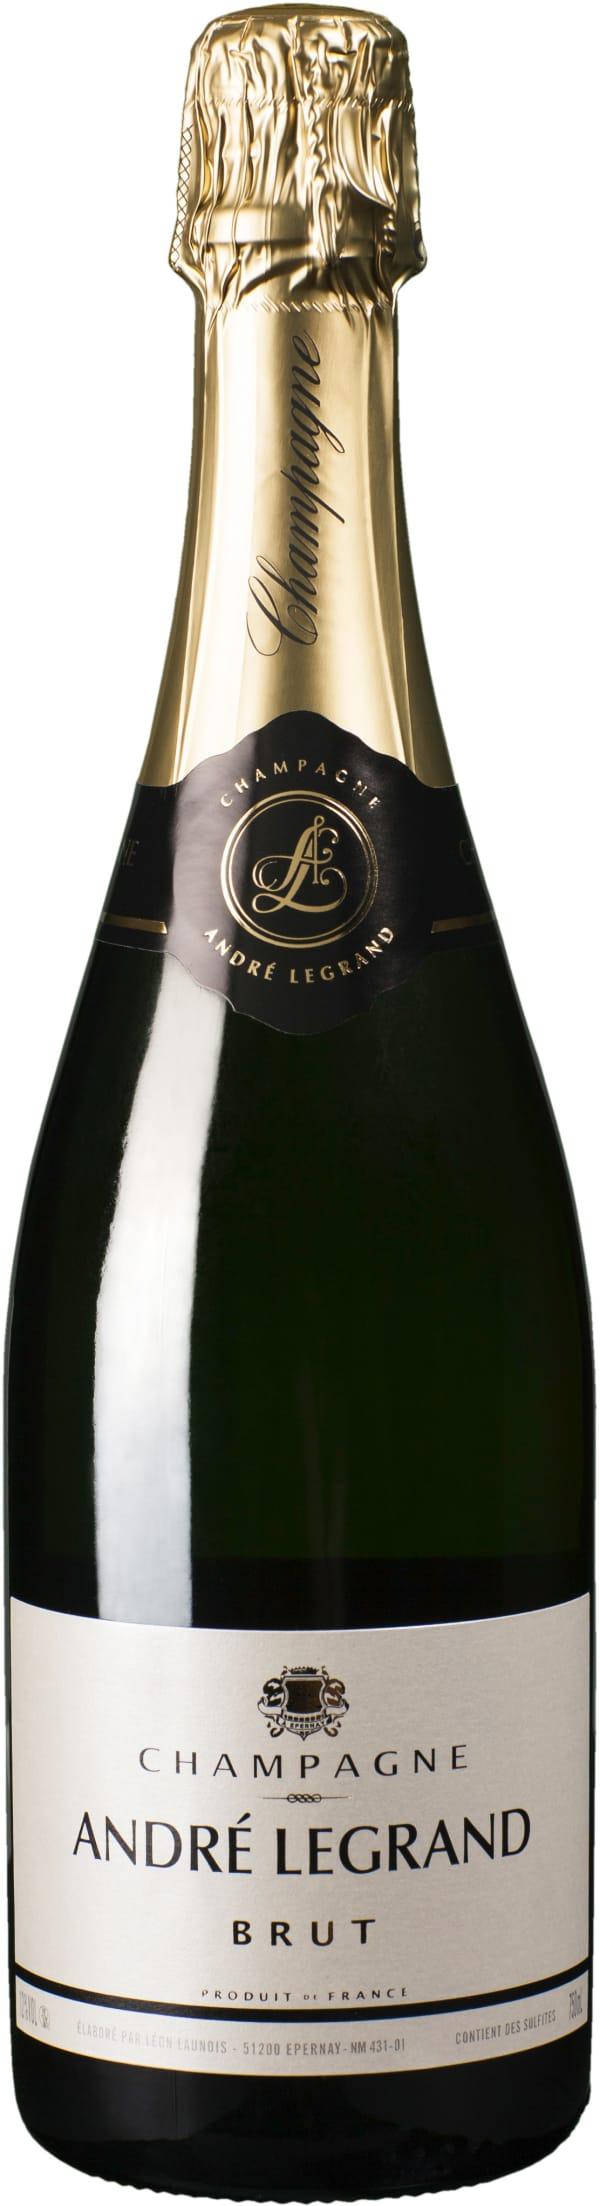 André Legrand Champagne Brut